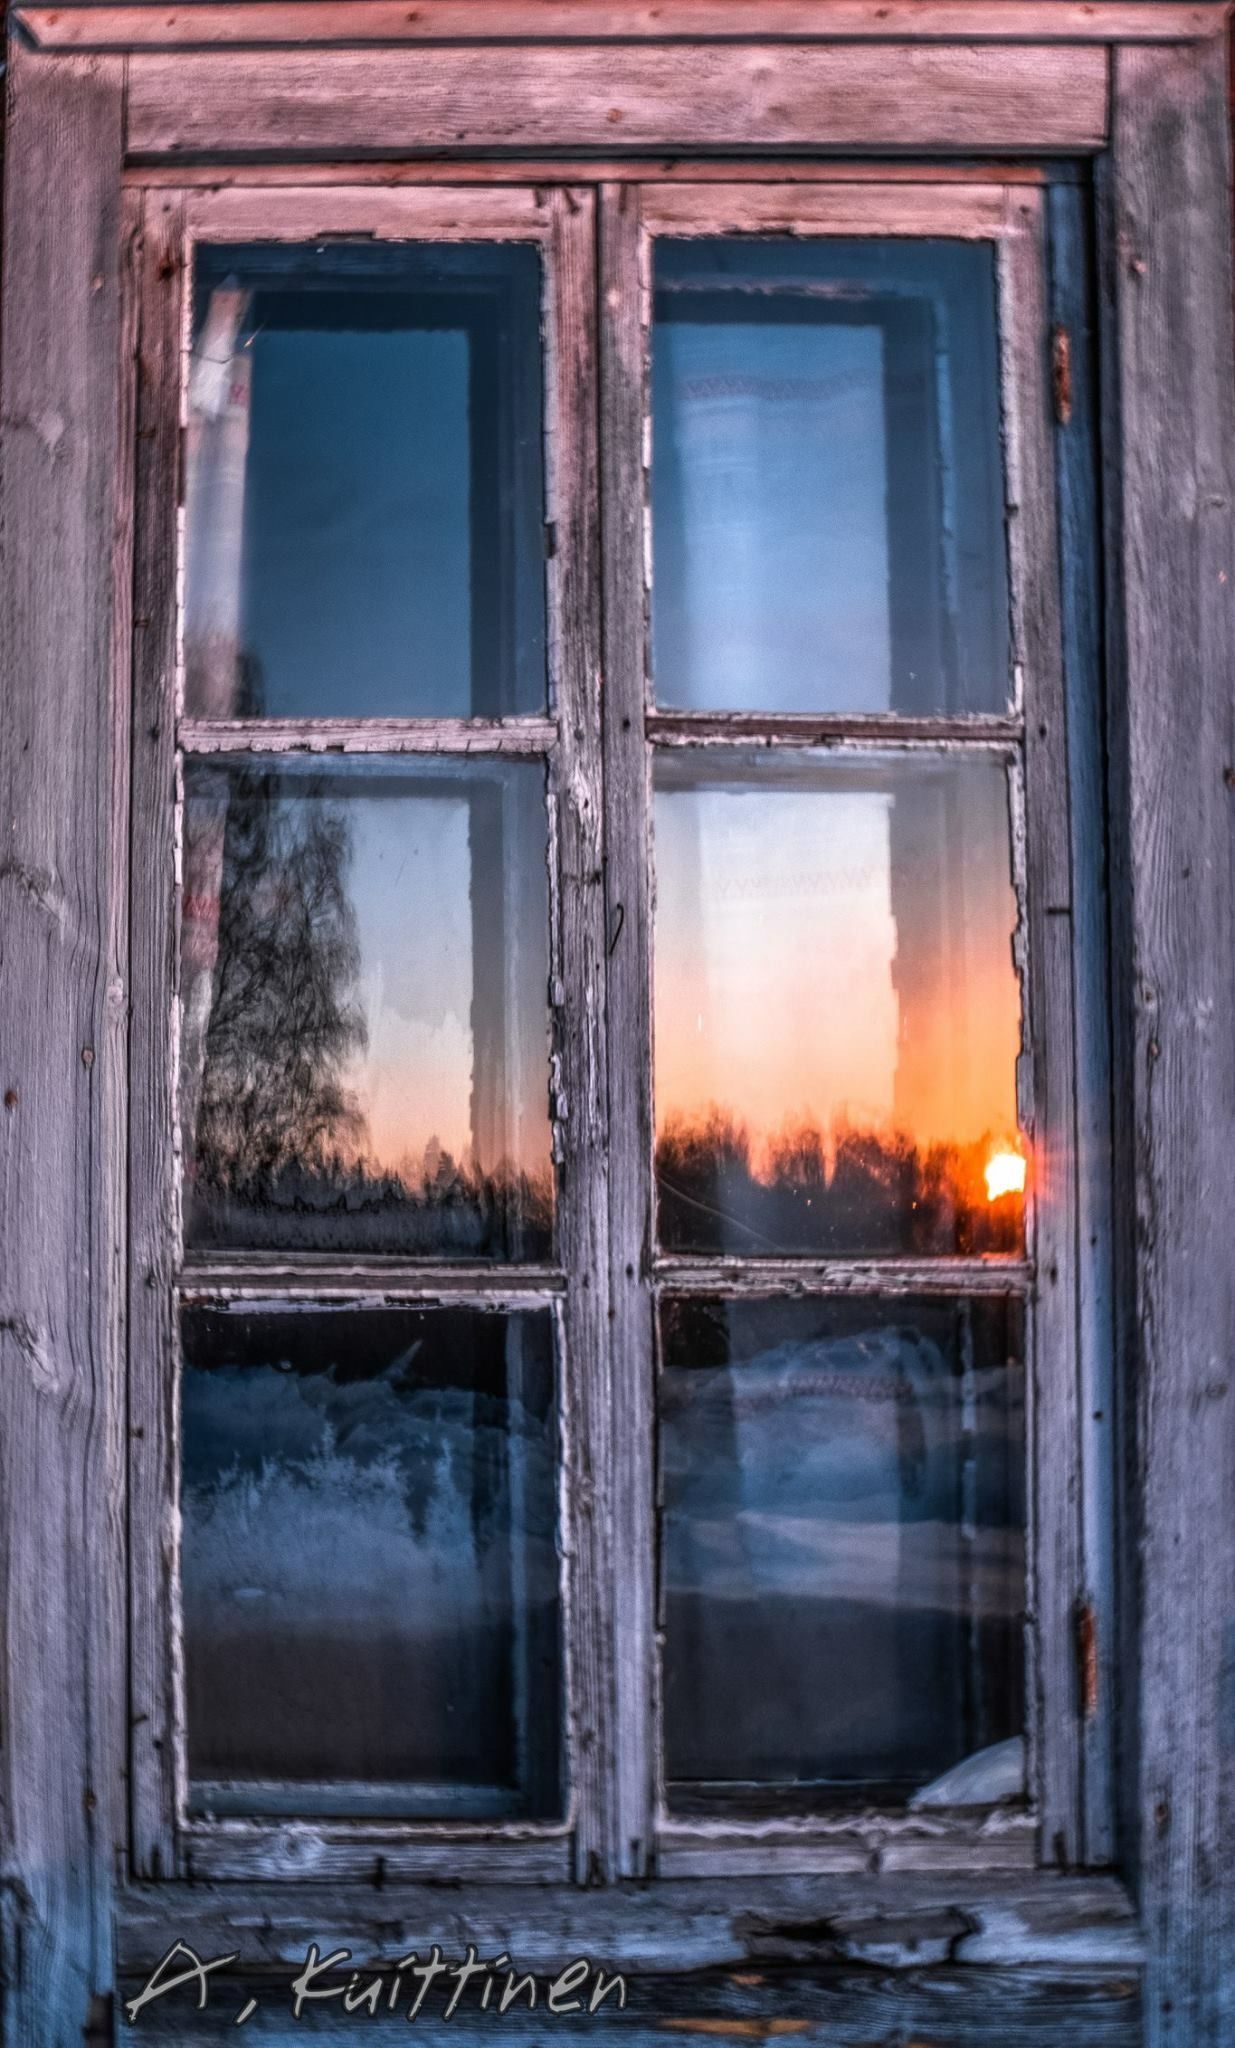 фото окон старого дома ночью нас можно